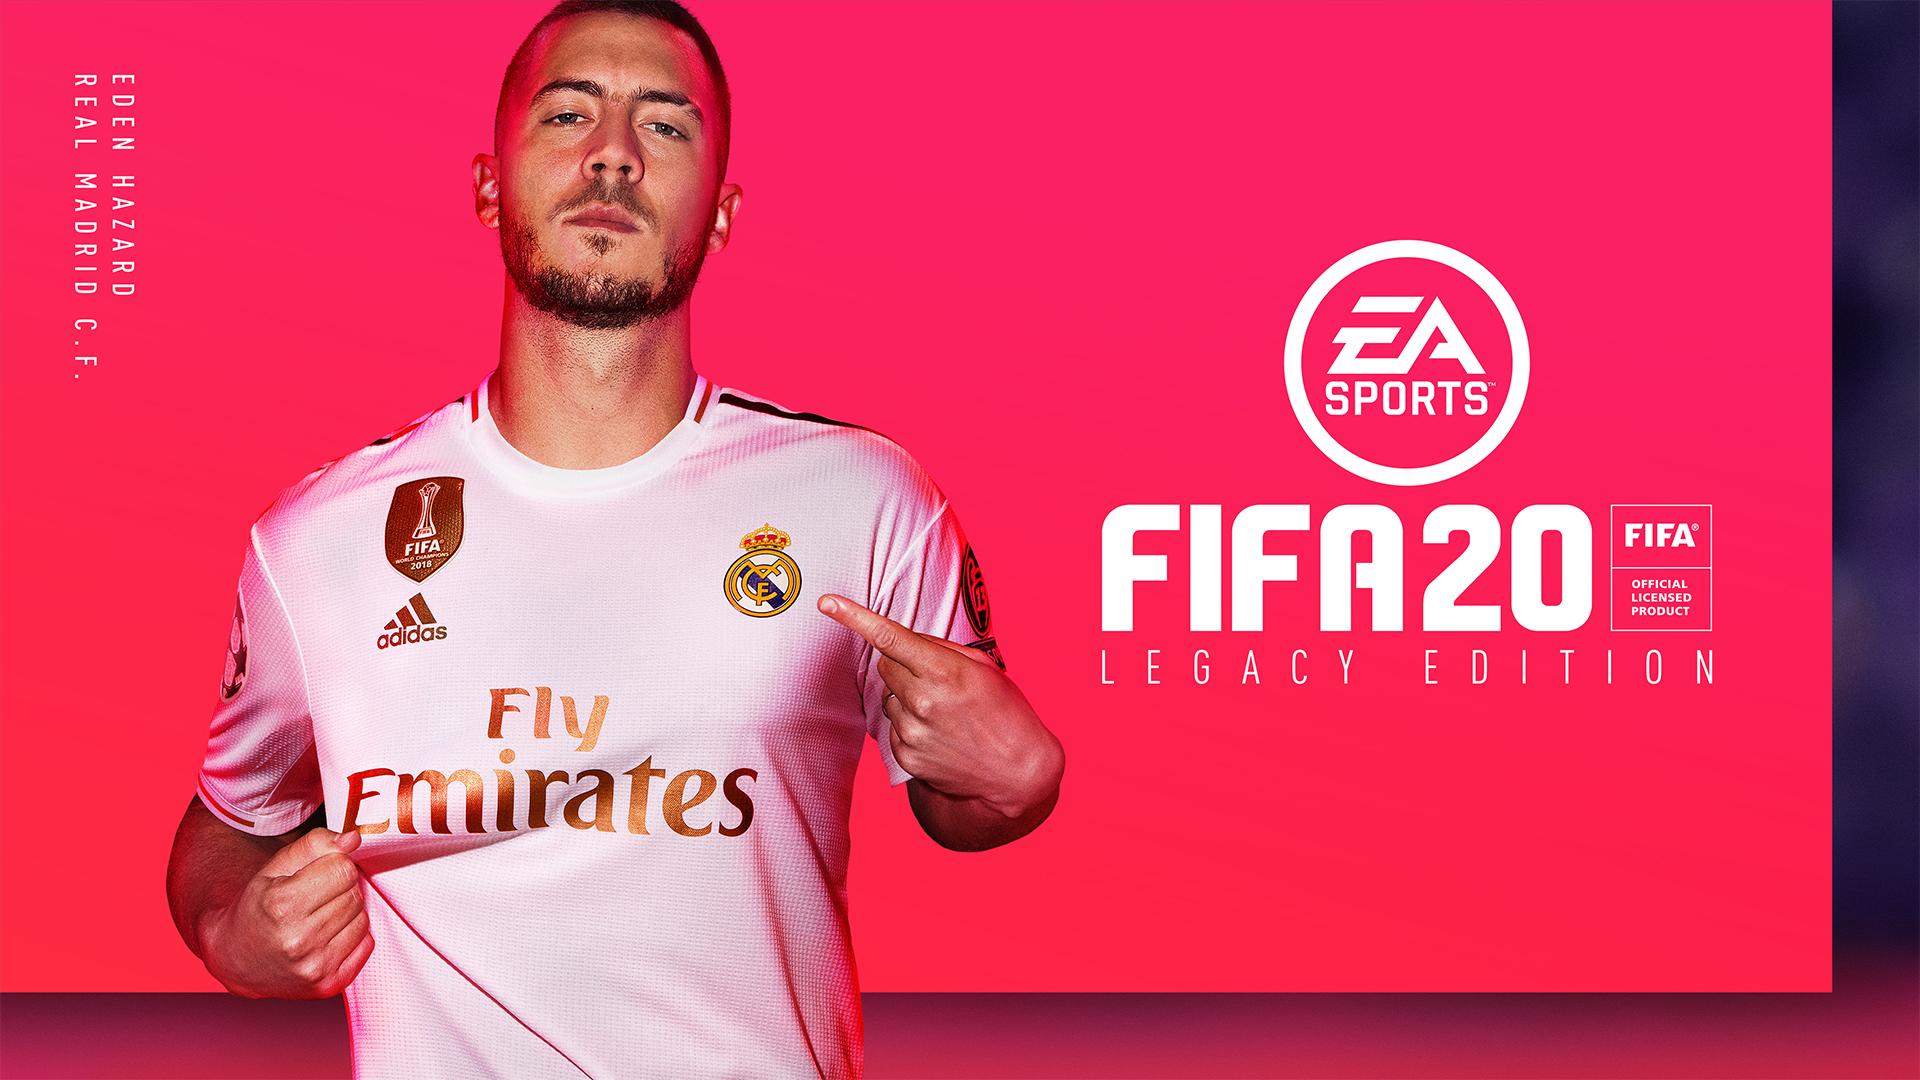 Nintendo eShop: FIFA 20 Nintendo Switch Legacy Edition